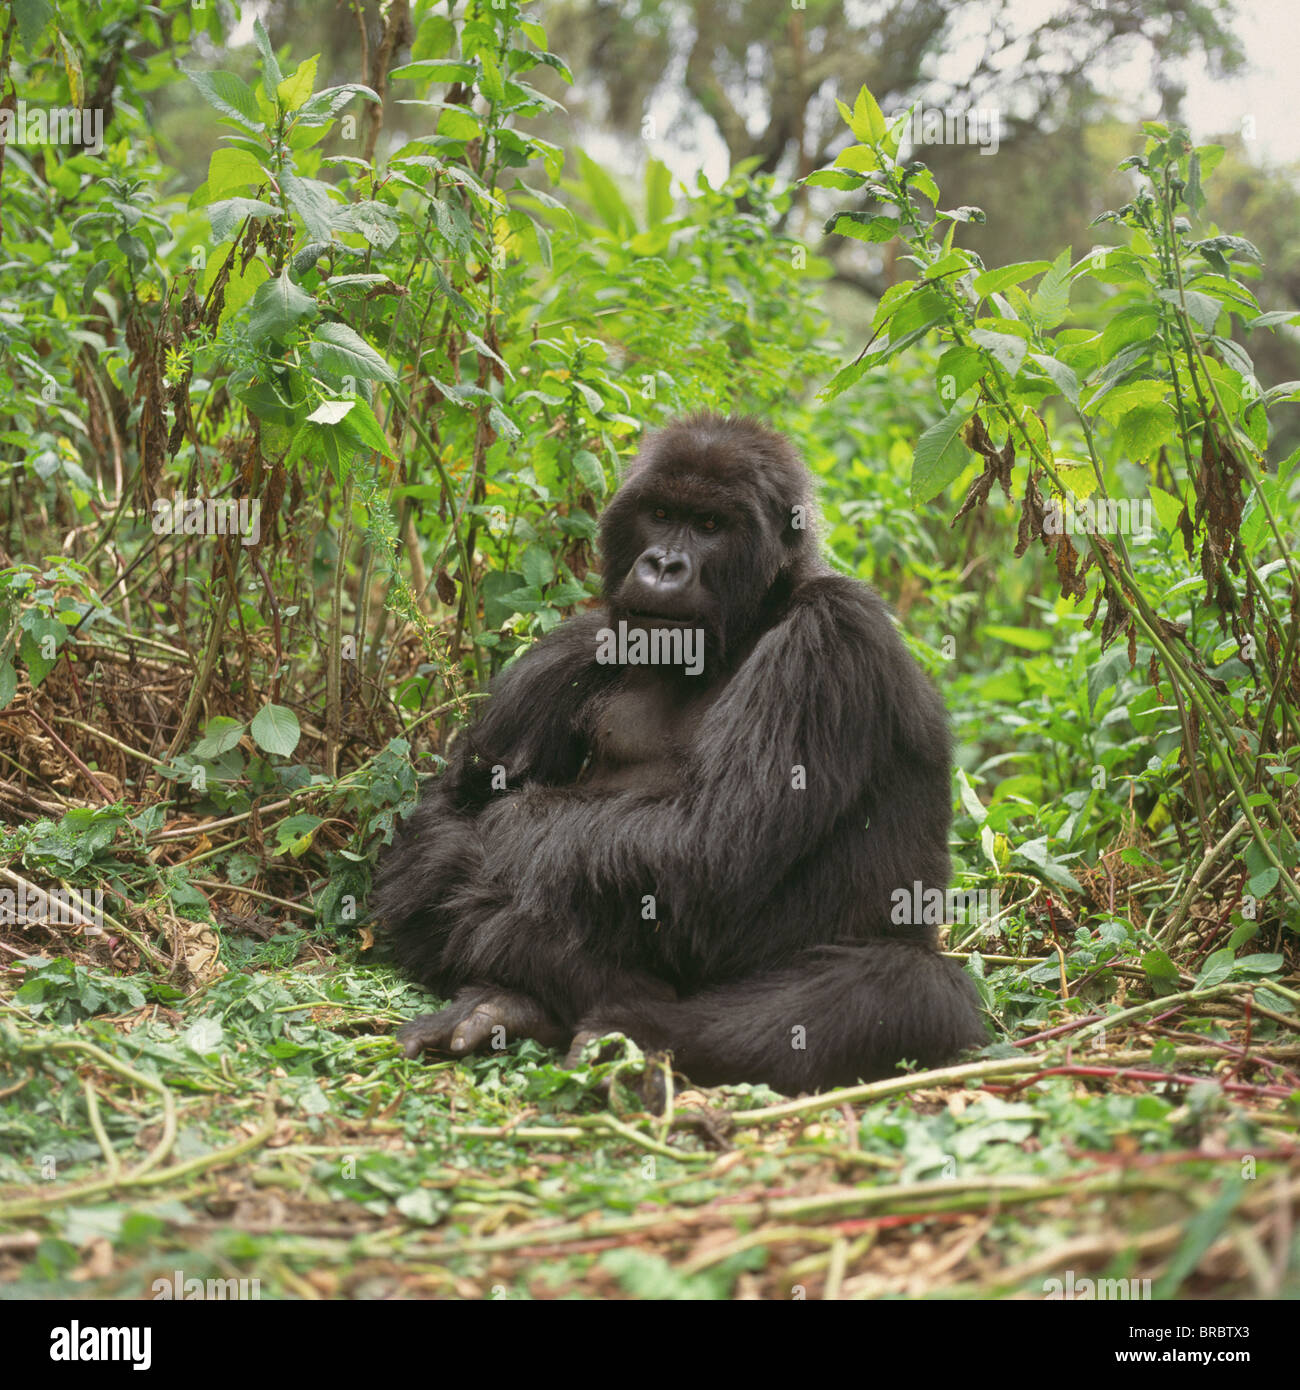 Mountain Gorillas (Gorilla gorilla beringei) blackback male, Virunga Volcanoes, Rwanda - Stock Image